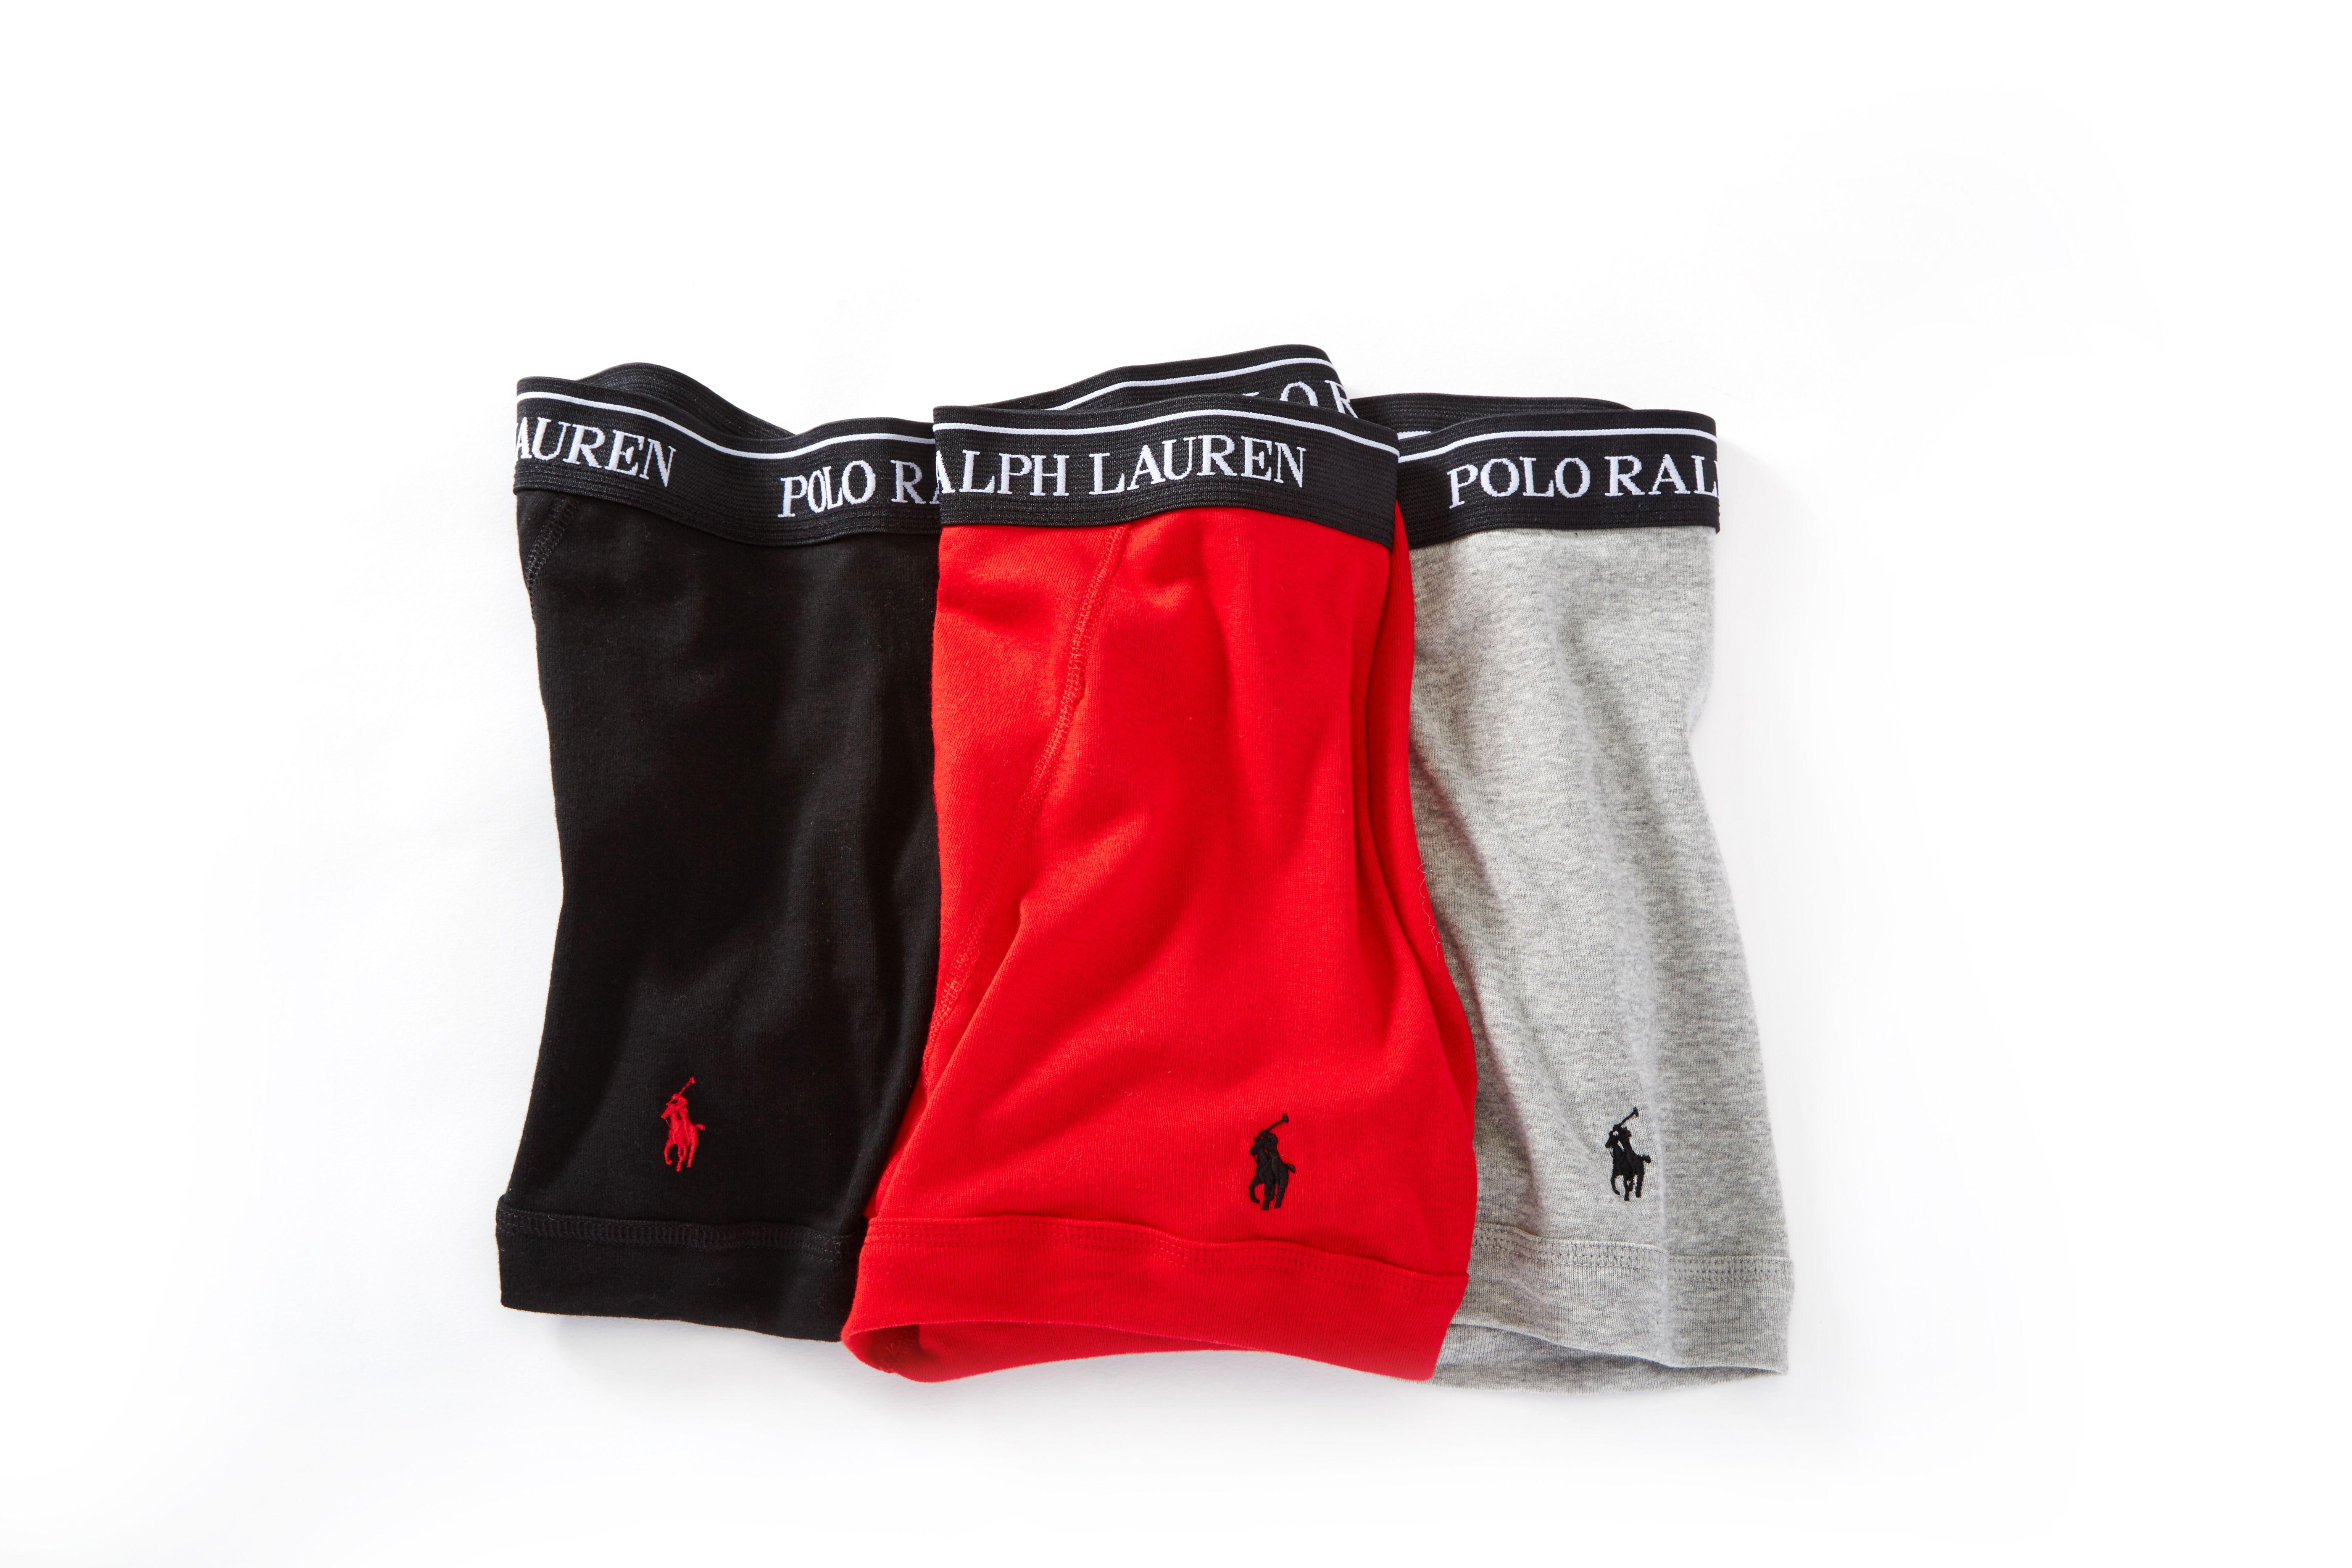 1855c6aa2cbe Polo Ralph Lauren Classic Fit 100% Cotton Boxer Briefs - 3 Pack  #BoxersBriefs #MensUnderwear #HisRoom #PoloRalphLauren